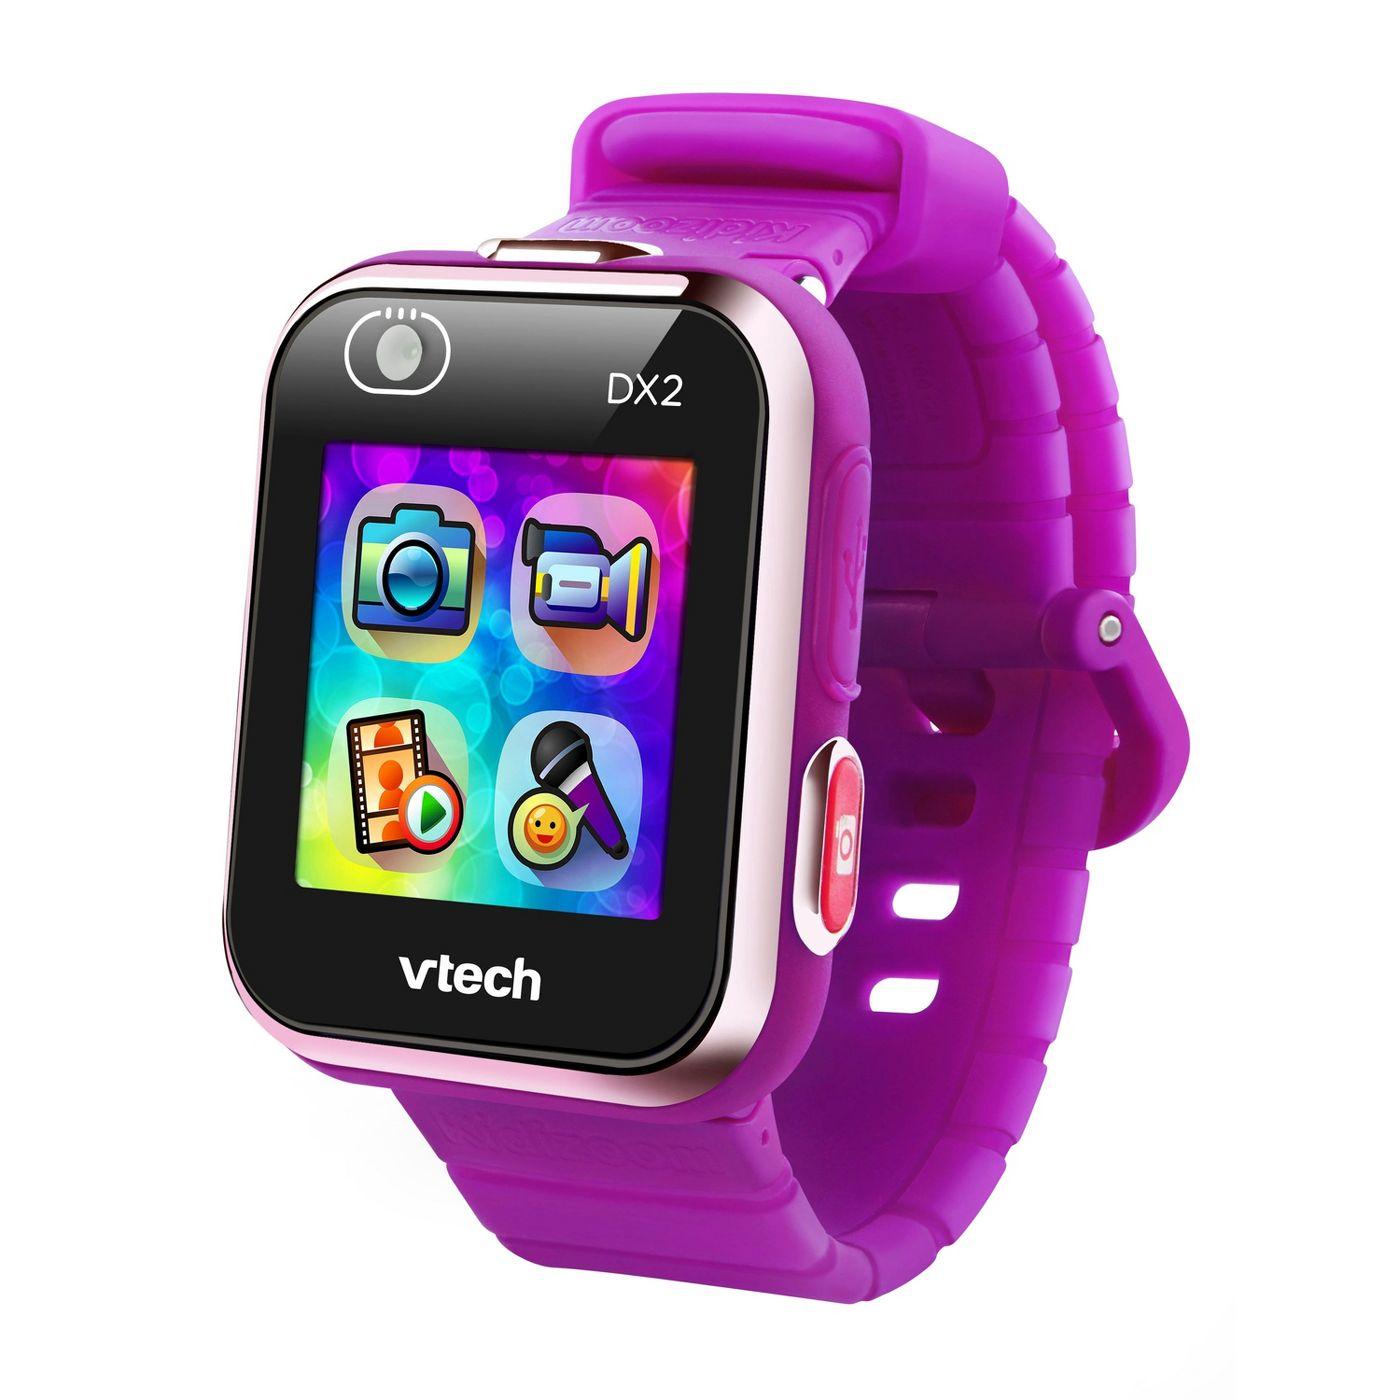 KidiZoom Smartwatch DX2 - image 1 of 7